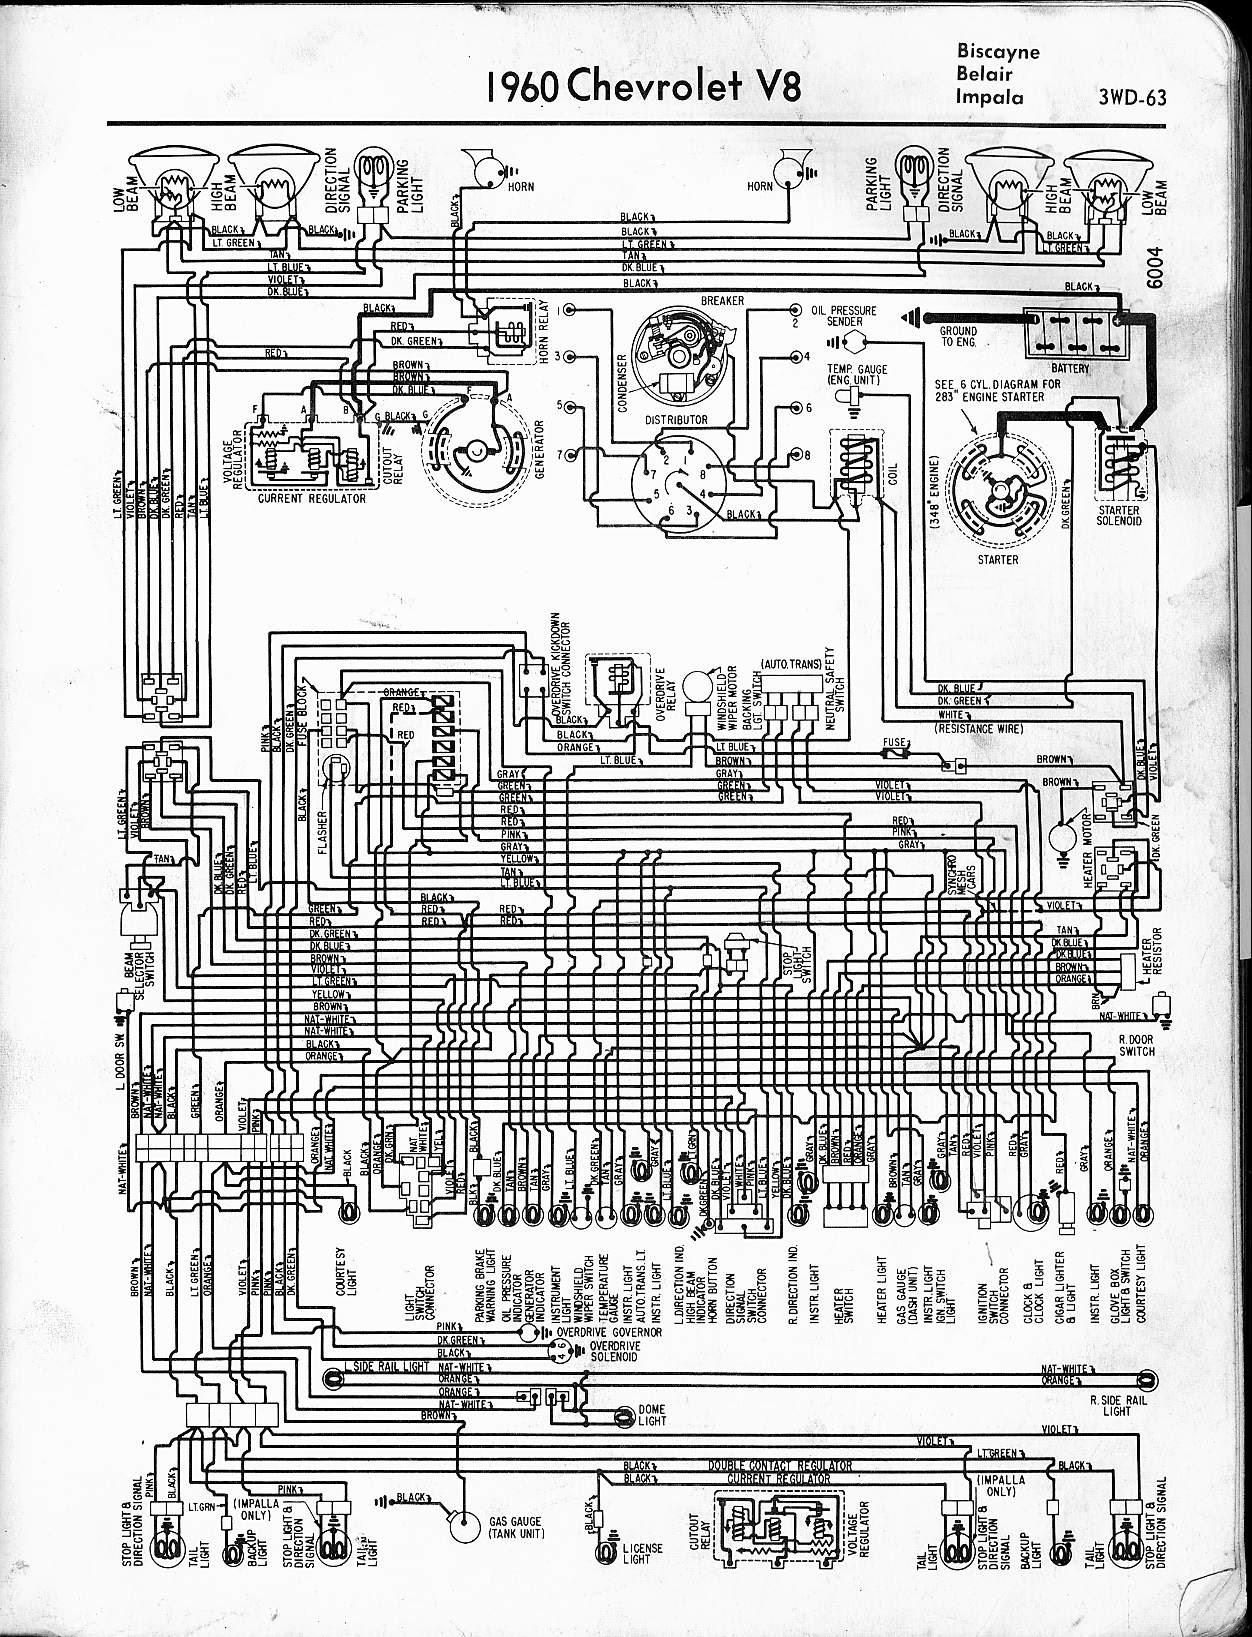 2005 Chevy Silverado Engine Wiring Diagram Wiring Diagram Corsa A Corsa A Pasticceriagele It